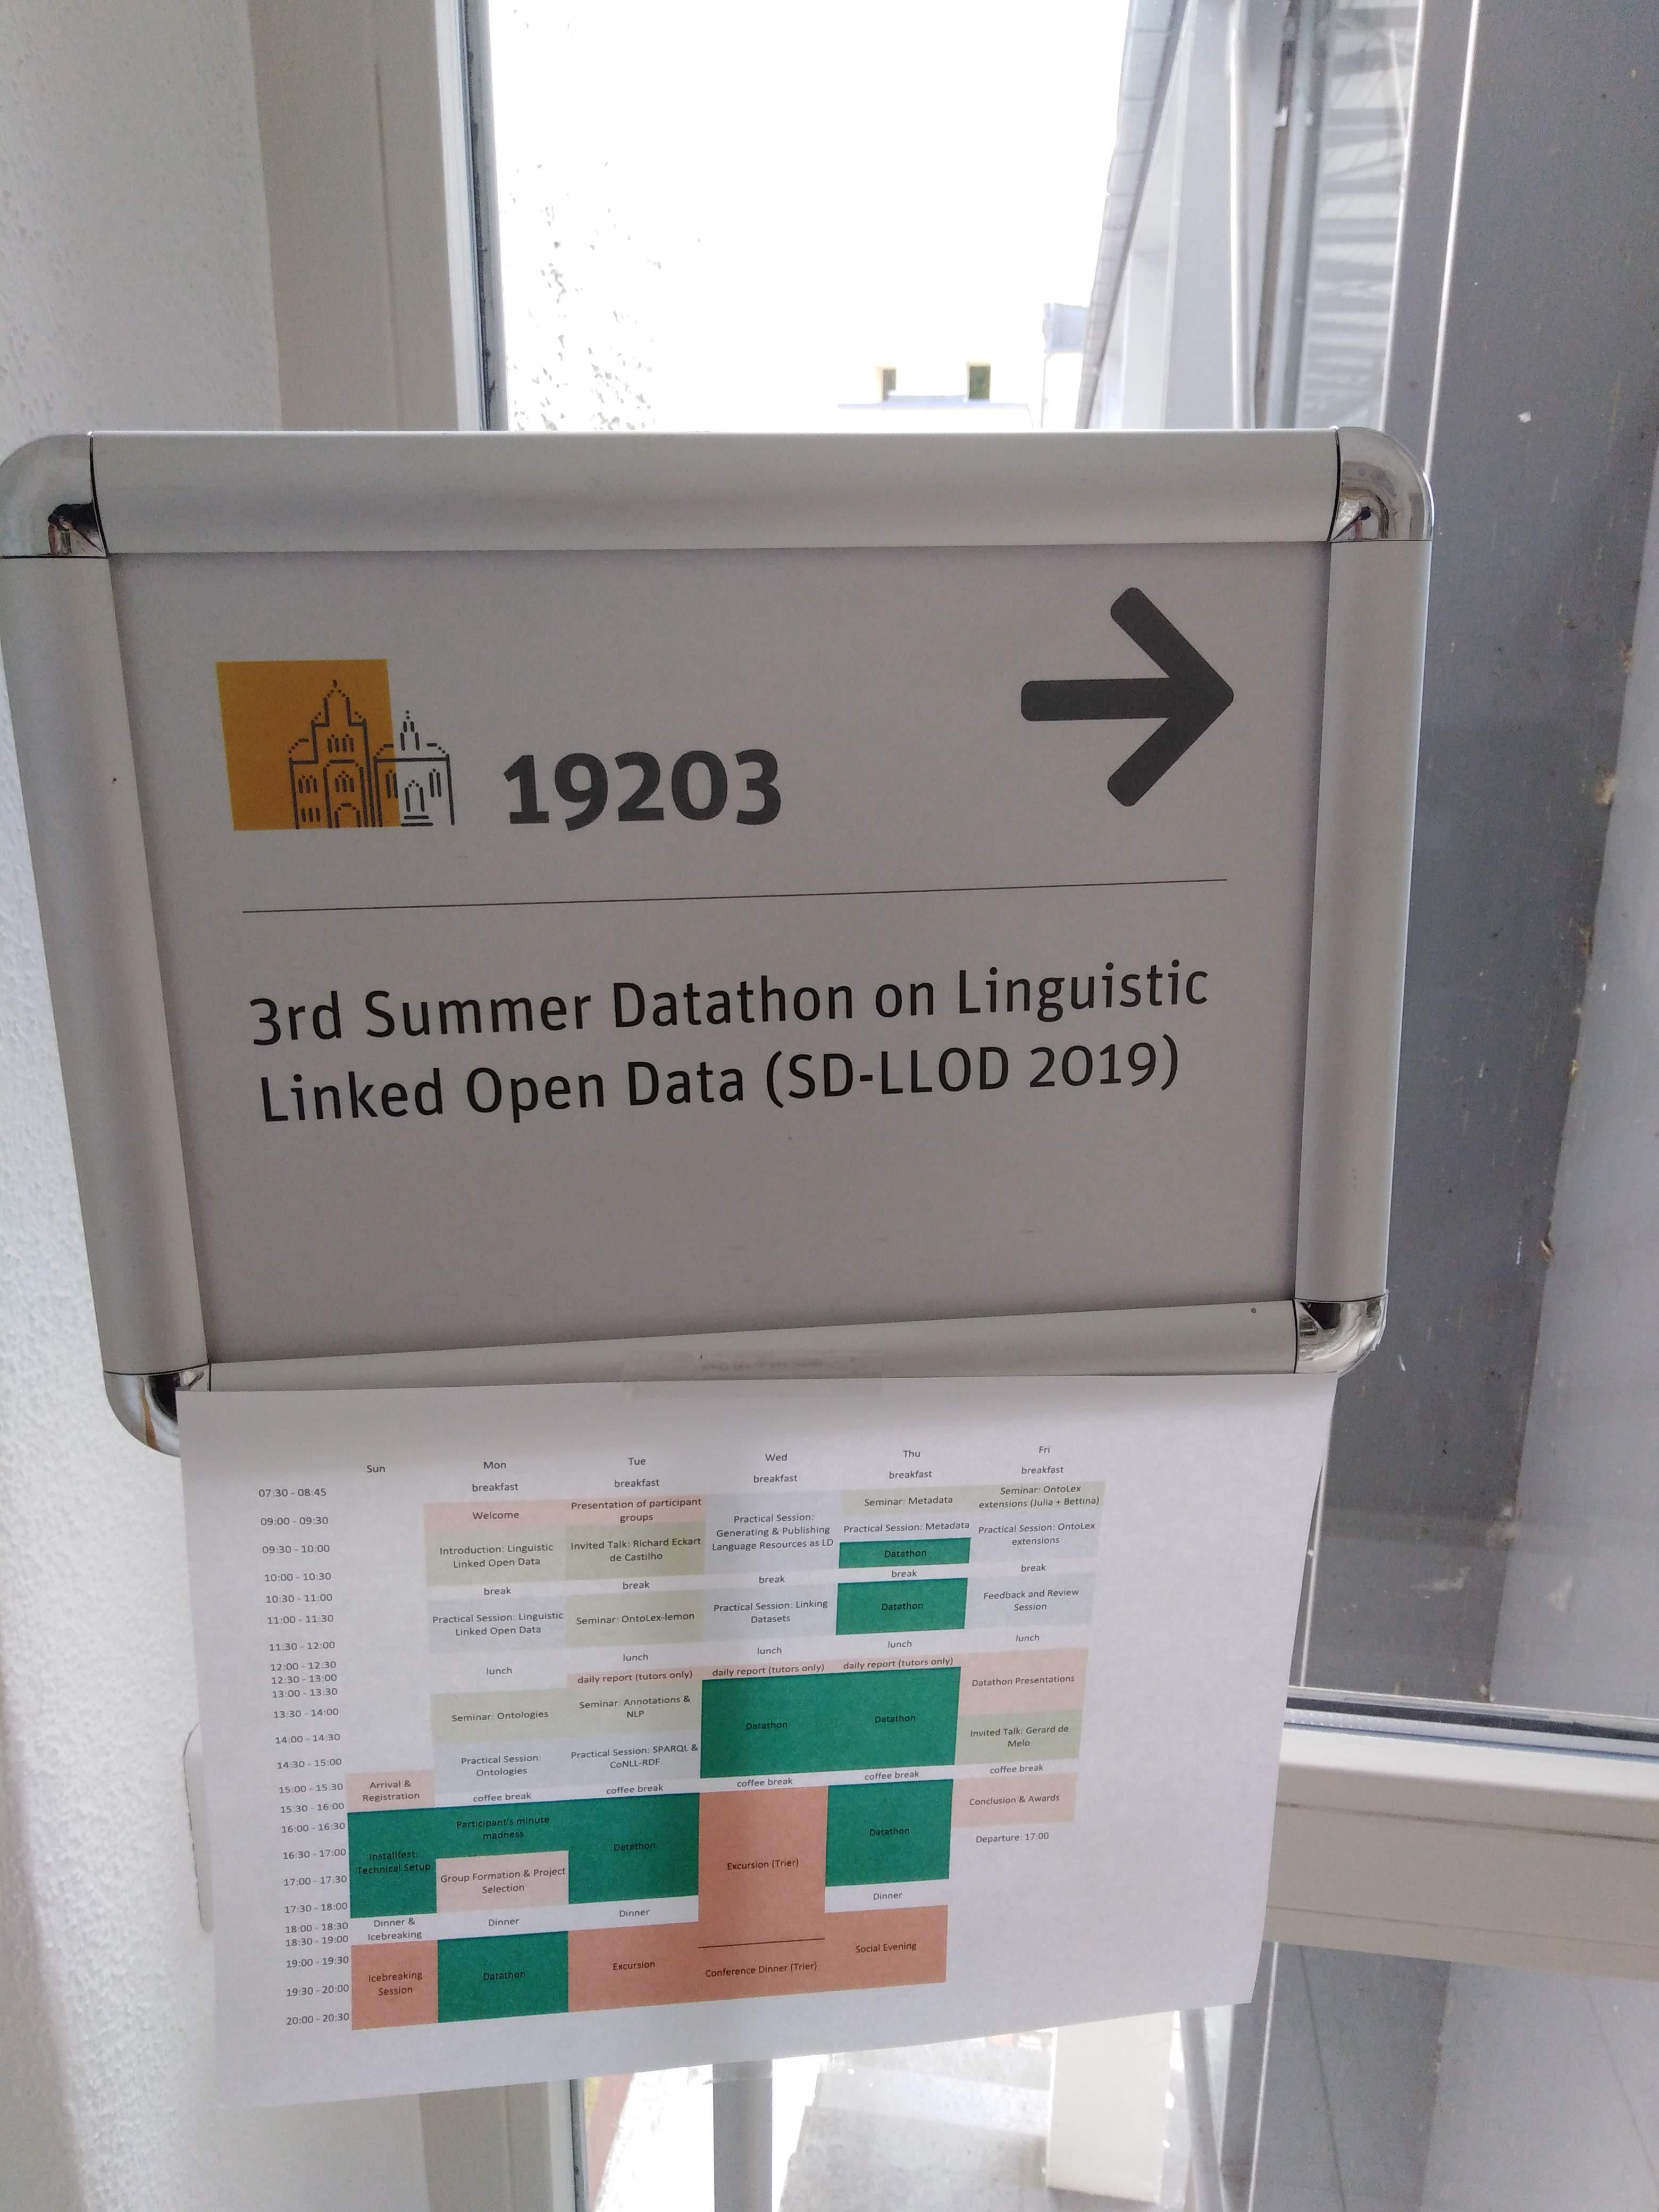 3rd Summer Datathon on Linguistic Linked Open Data